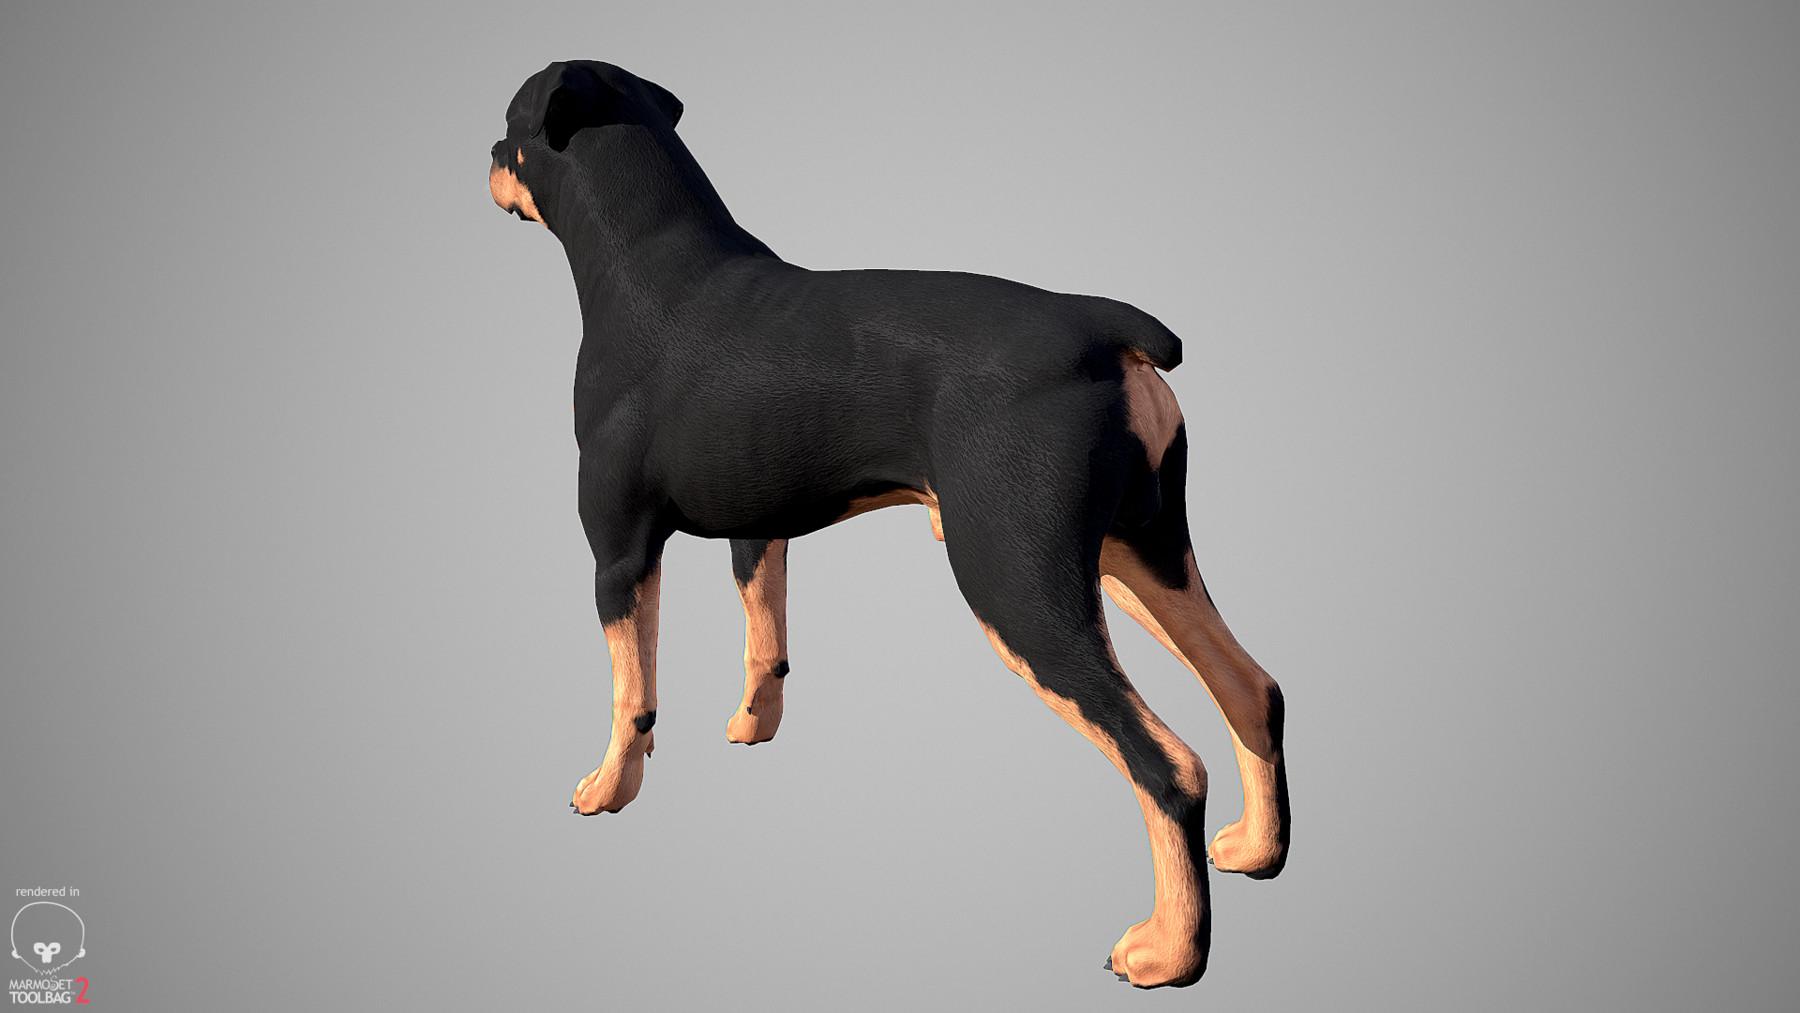 Rottweiler by alexlashko marmoset 04